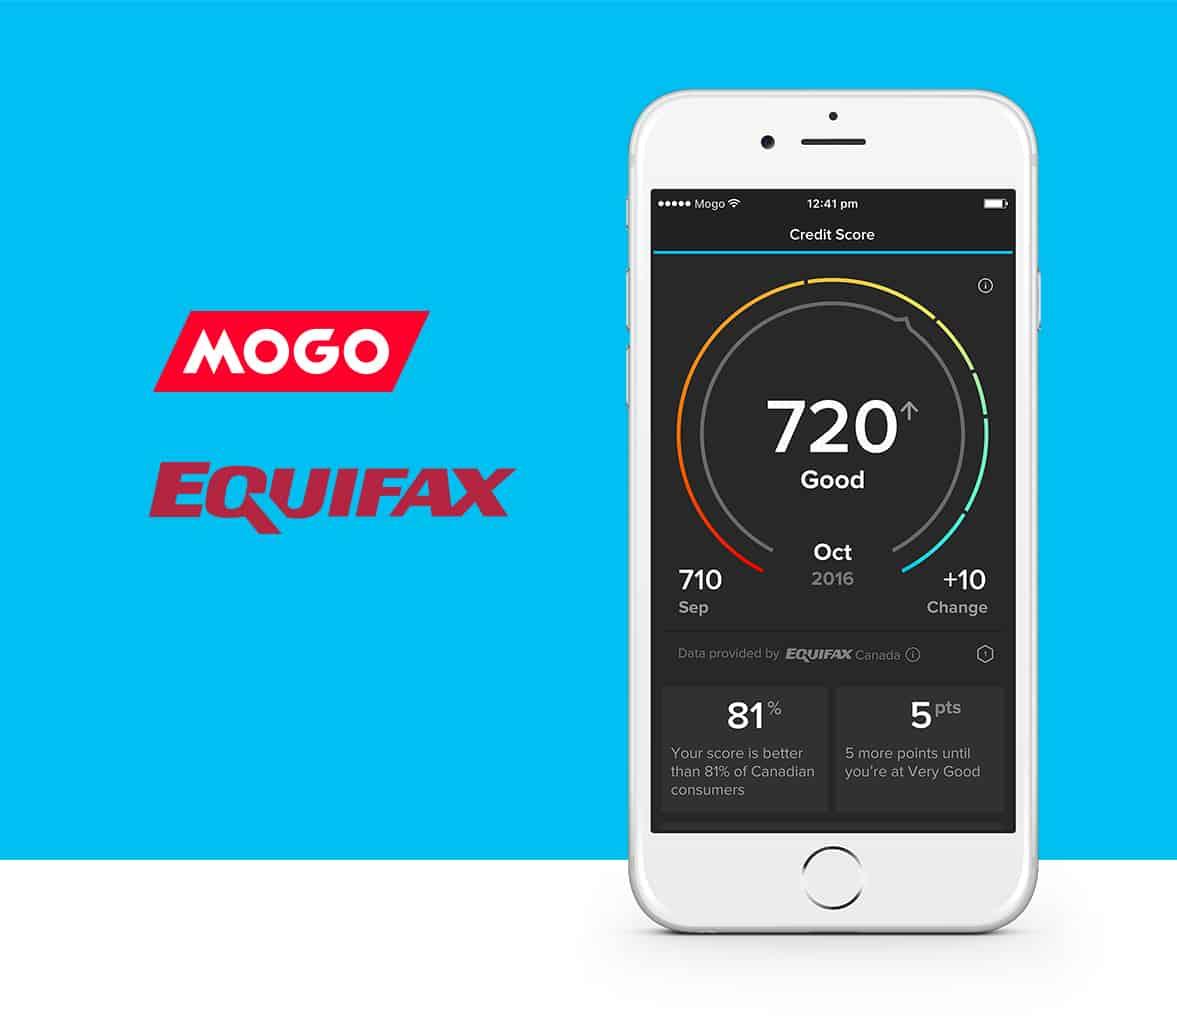 mogo_credit-score_dashboard-app_comparewise